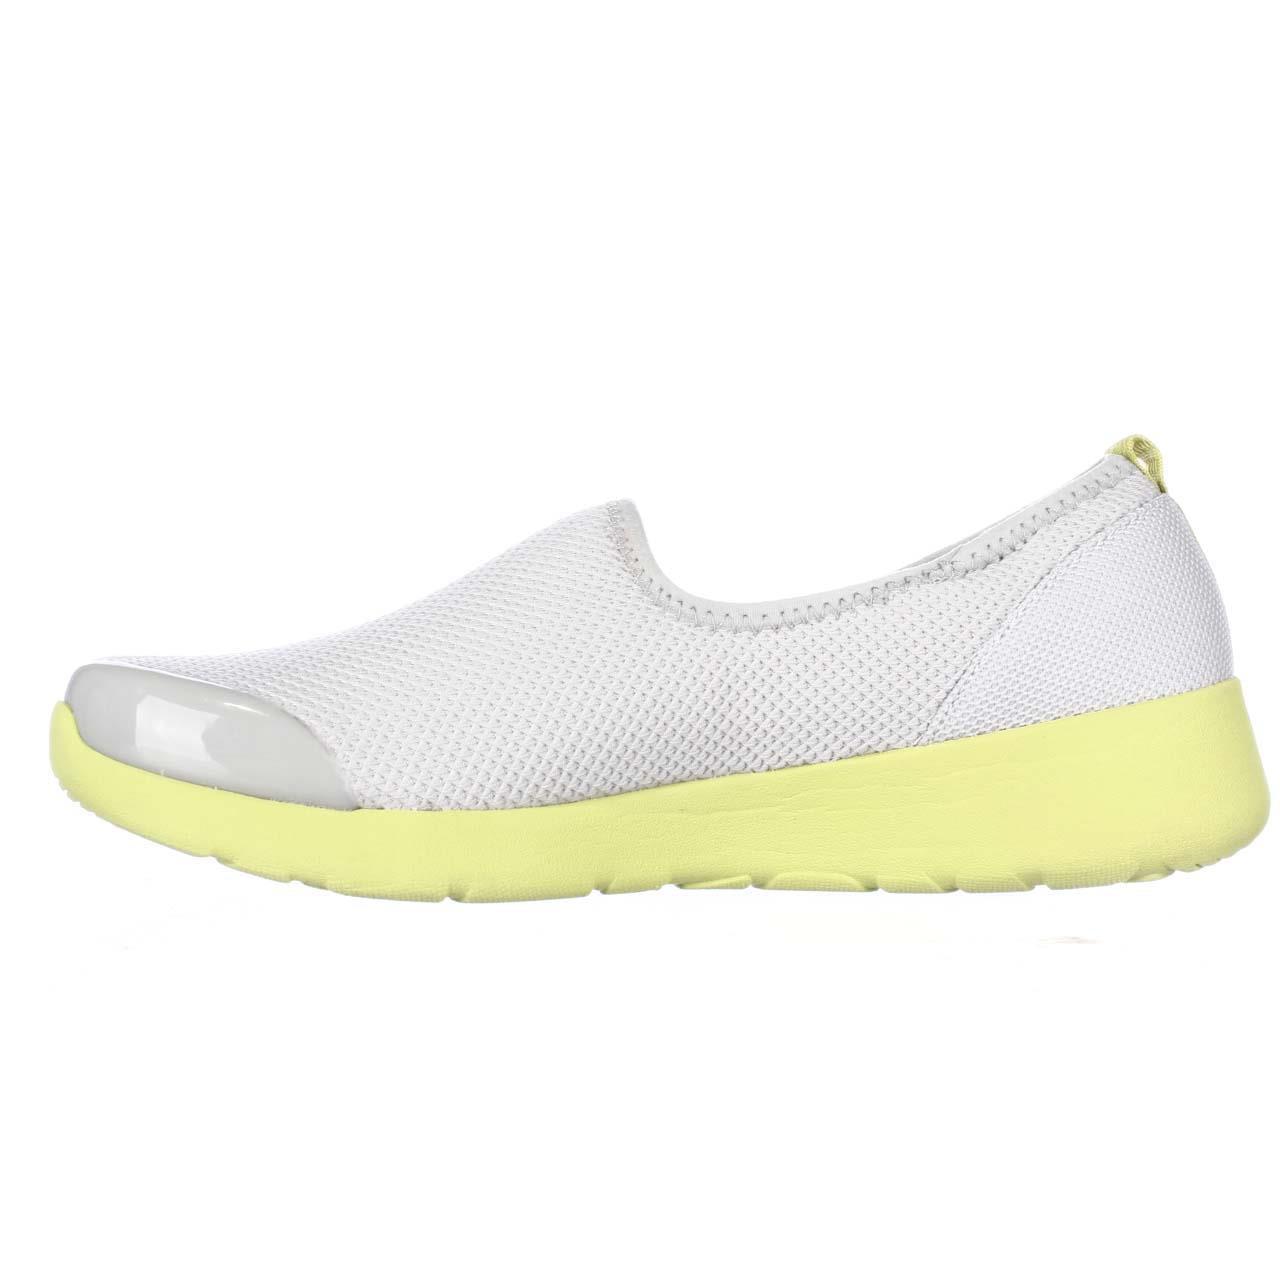 Womens Easy - Spirit Funrunner Sport Flats - Easy Light Gray Yellow bd94bb